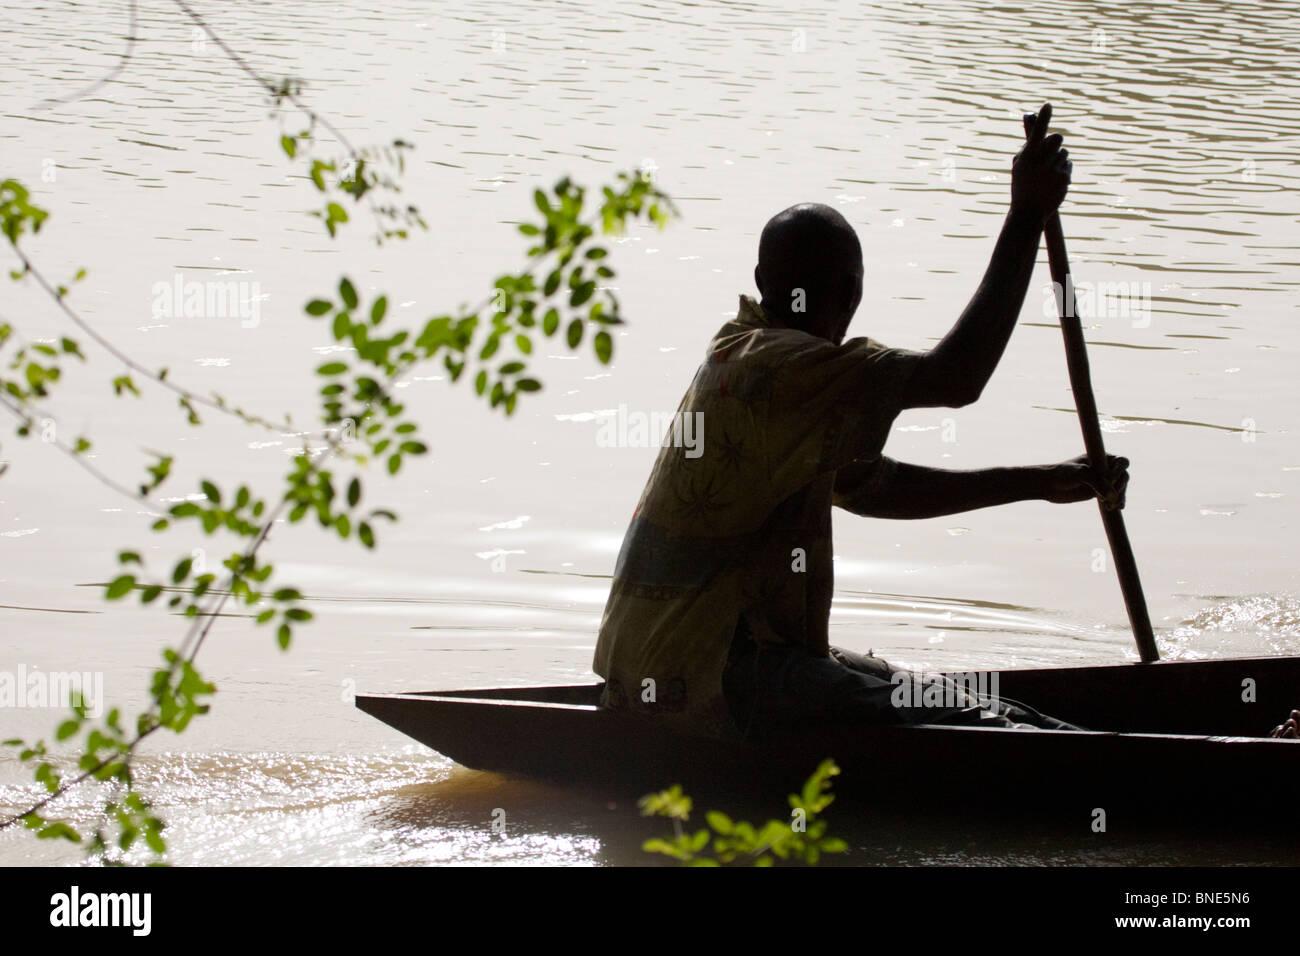 Fisherman cautiously passes the hippos in the Black Volta, Wechiau Community Hippo Sanctuary, near Wa, Ghana. - Stock Image